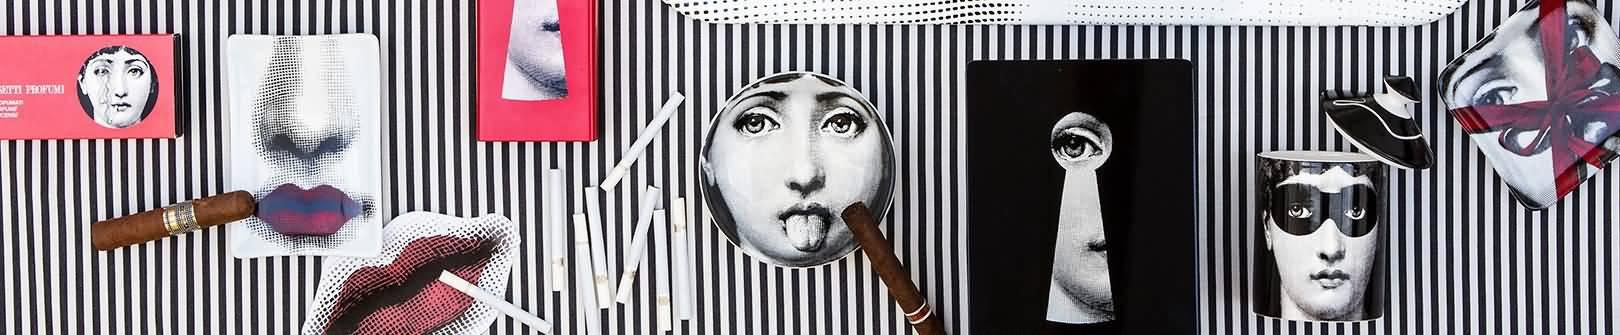 Smoking Accessories